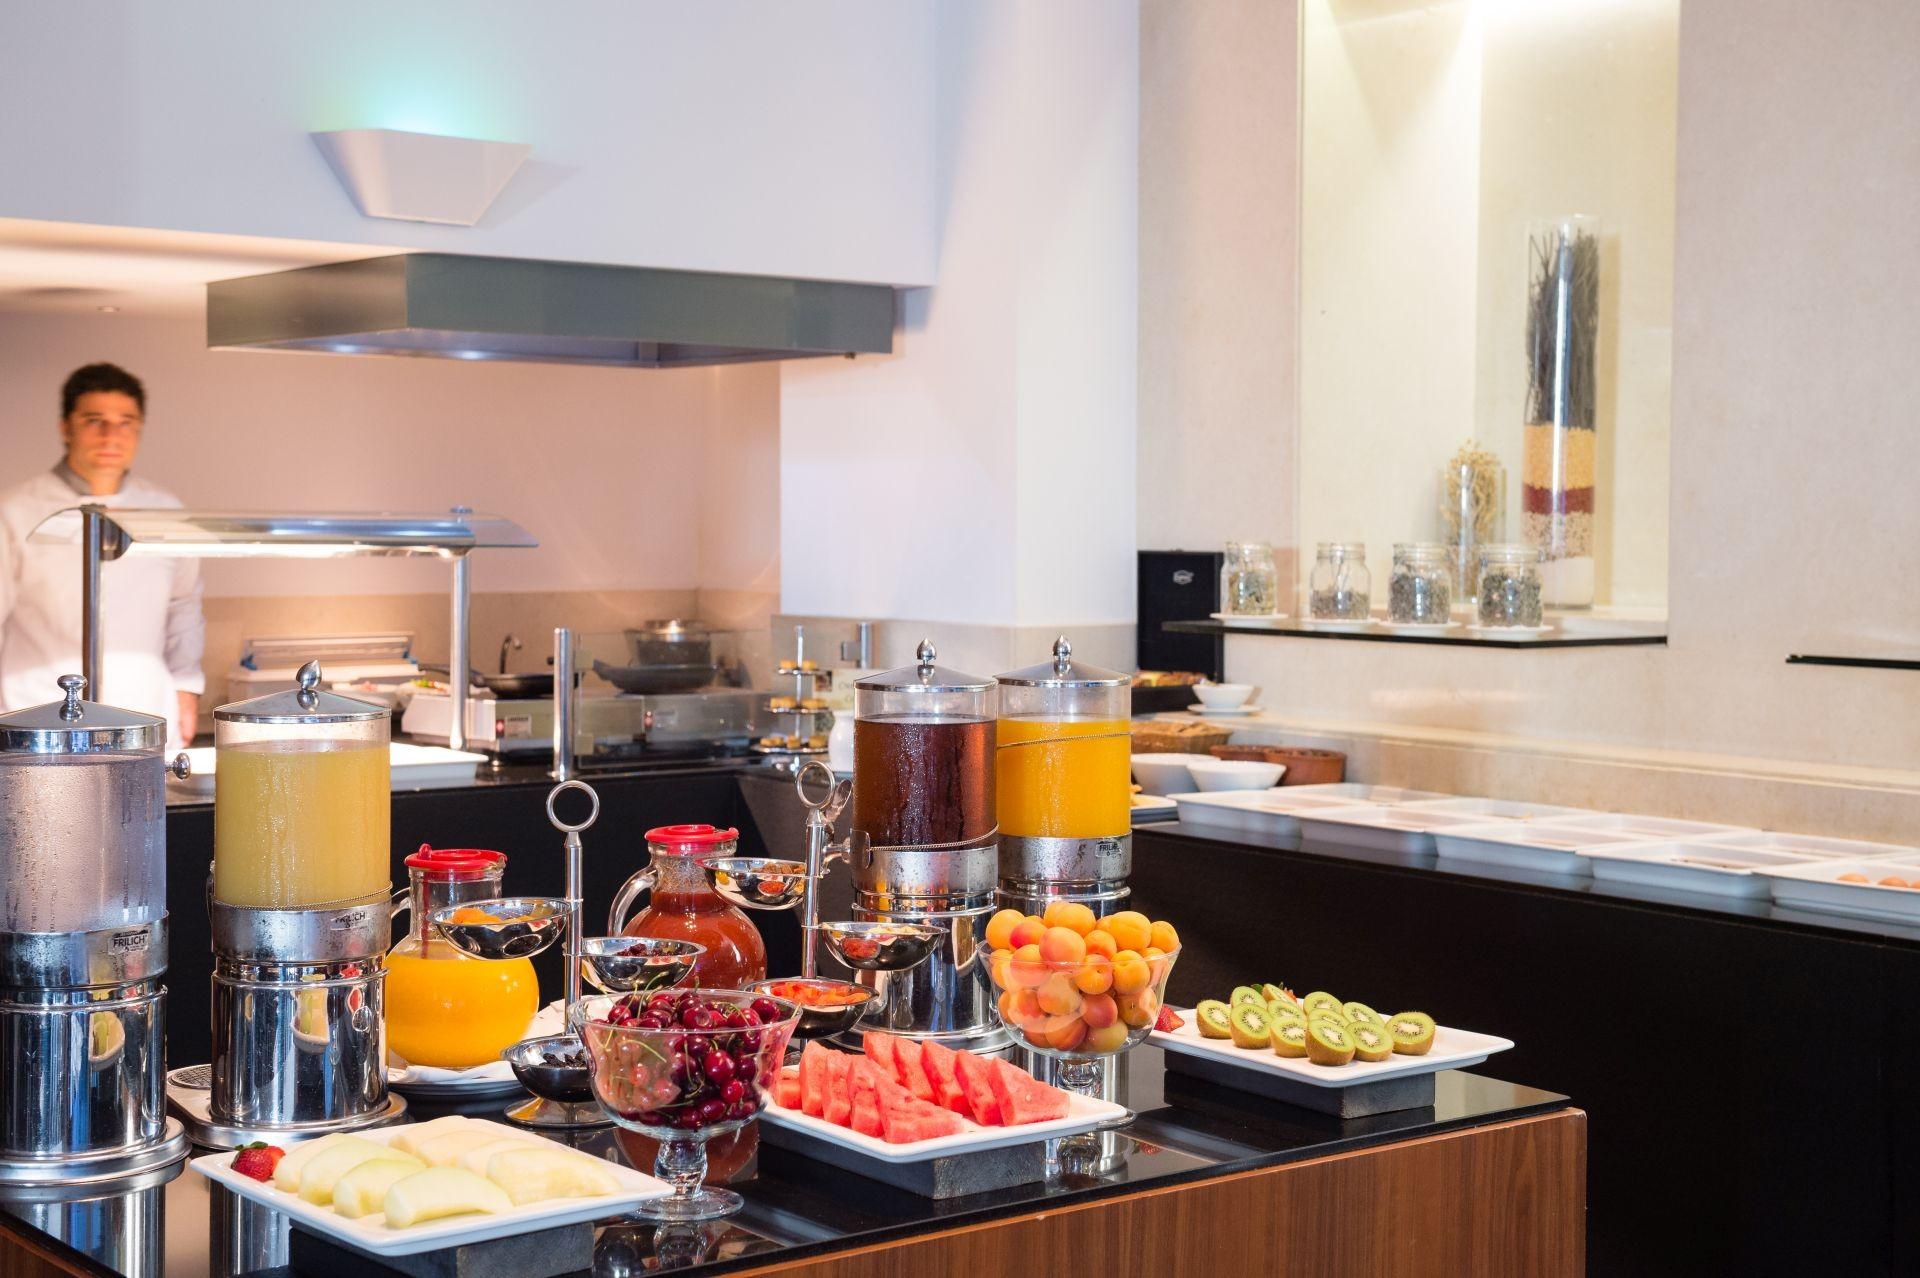 aquila atlantis hotel breakfast buffet 5 hotels in crete rh aquilahotels com